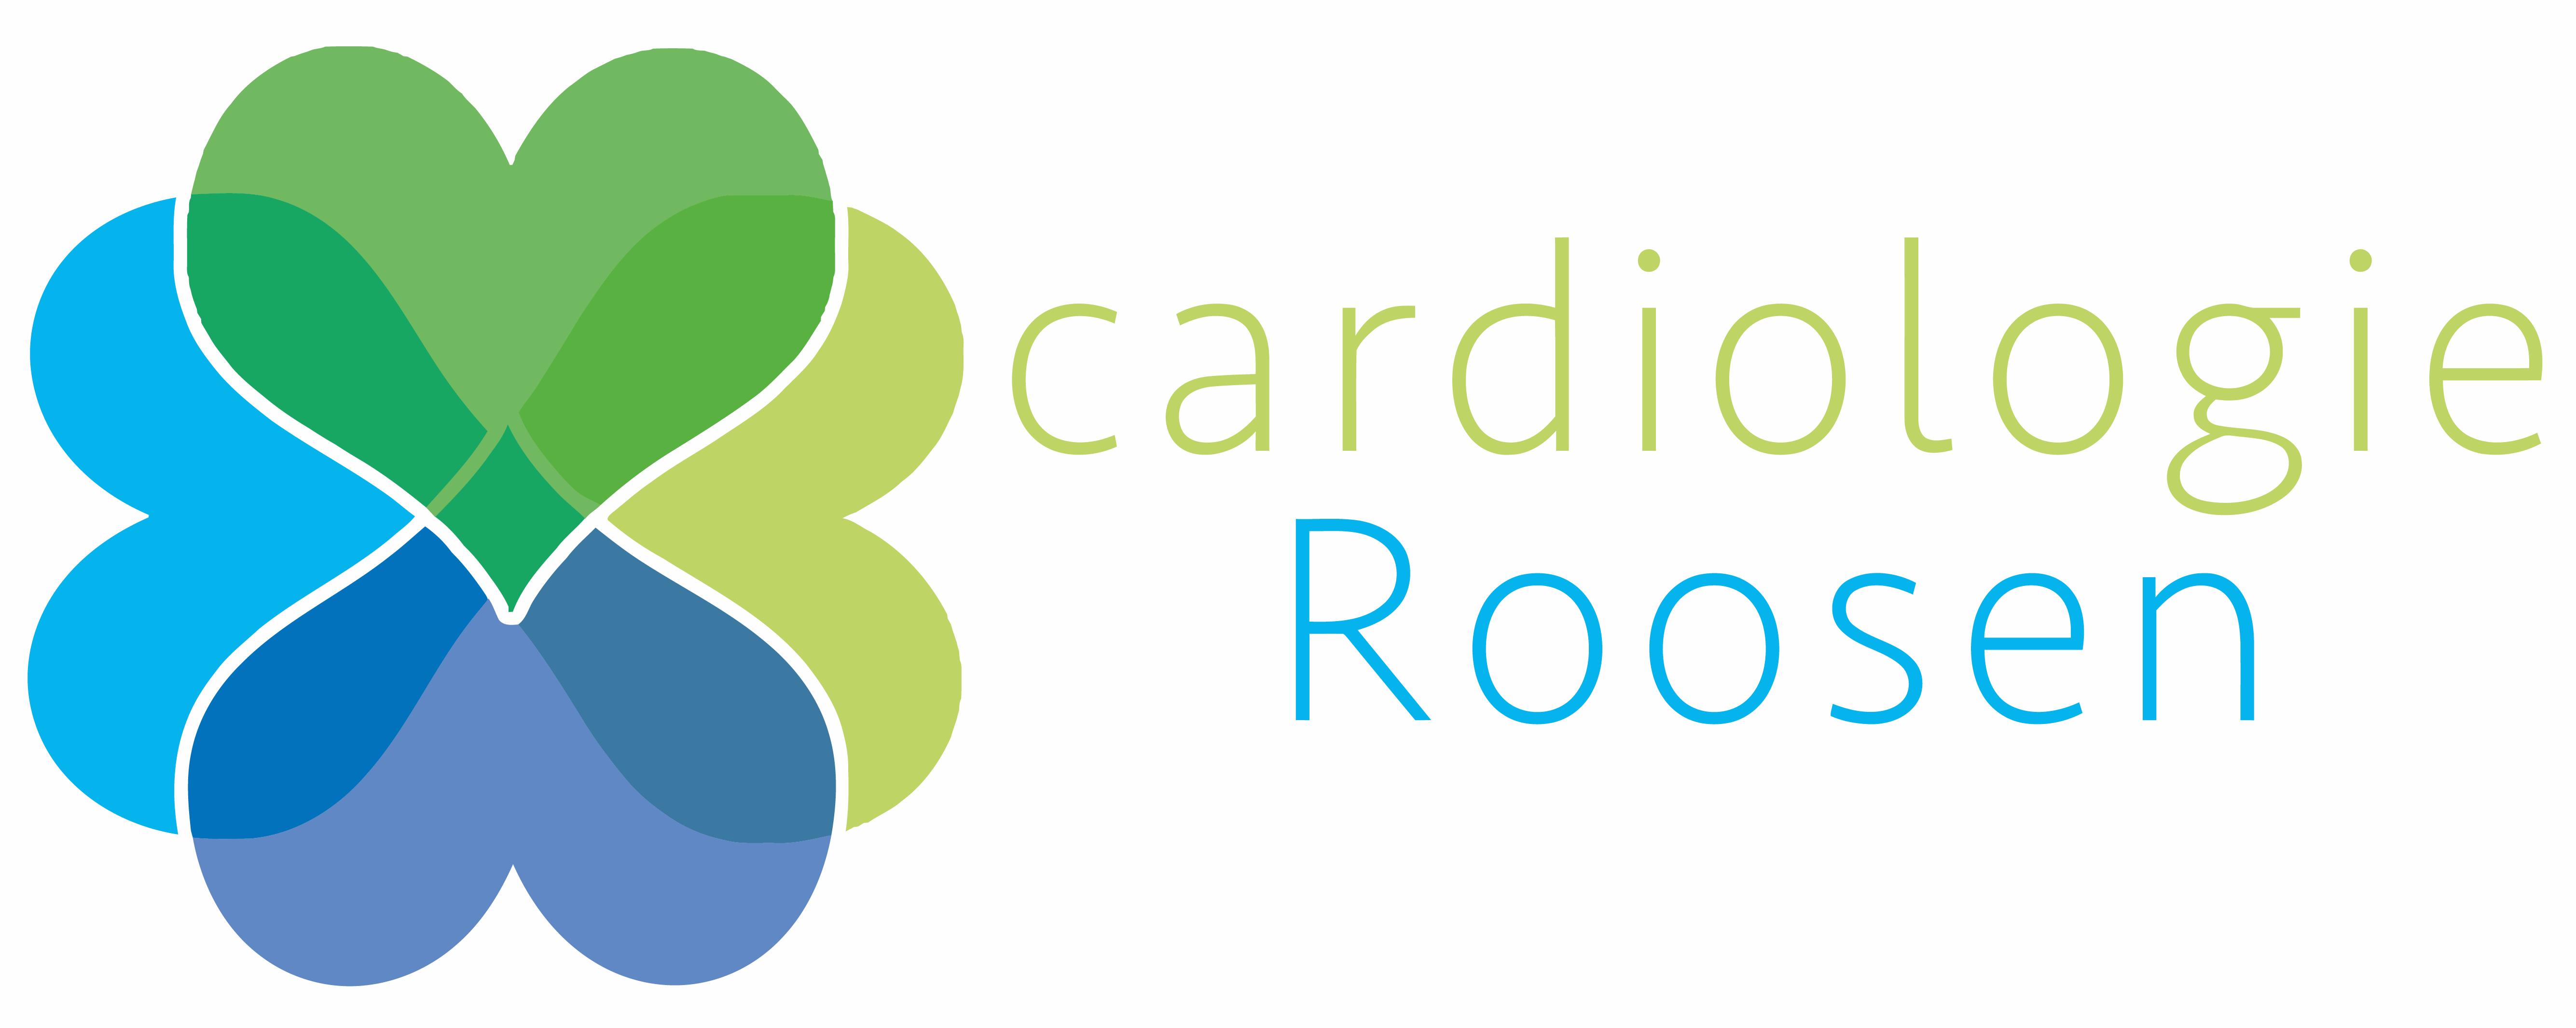 Cardiologie Roosen Logo